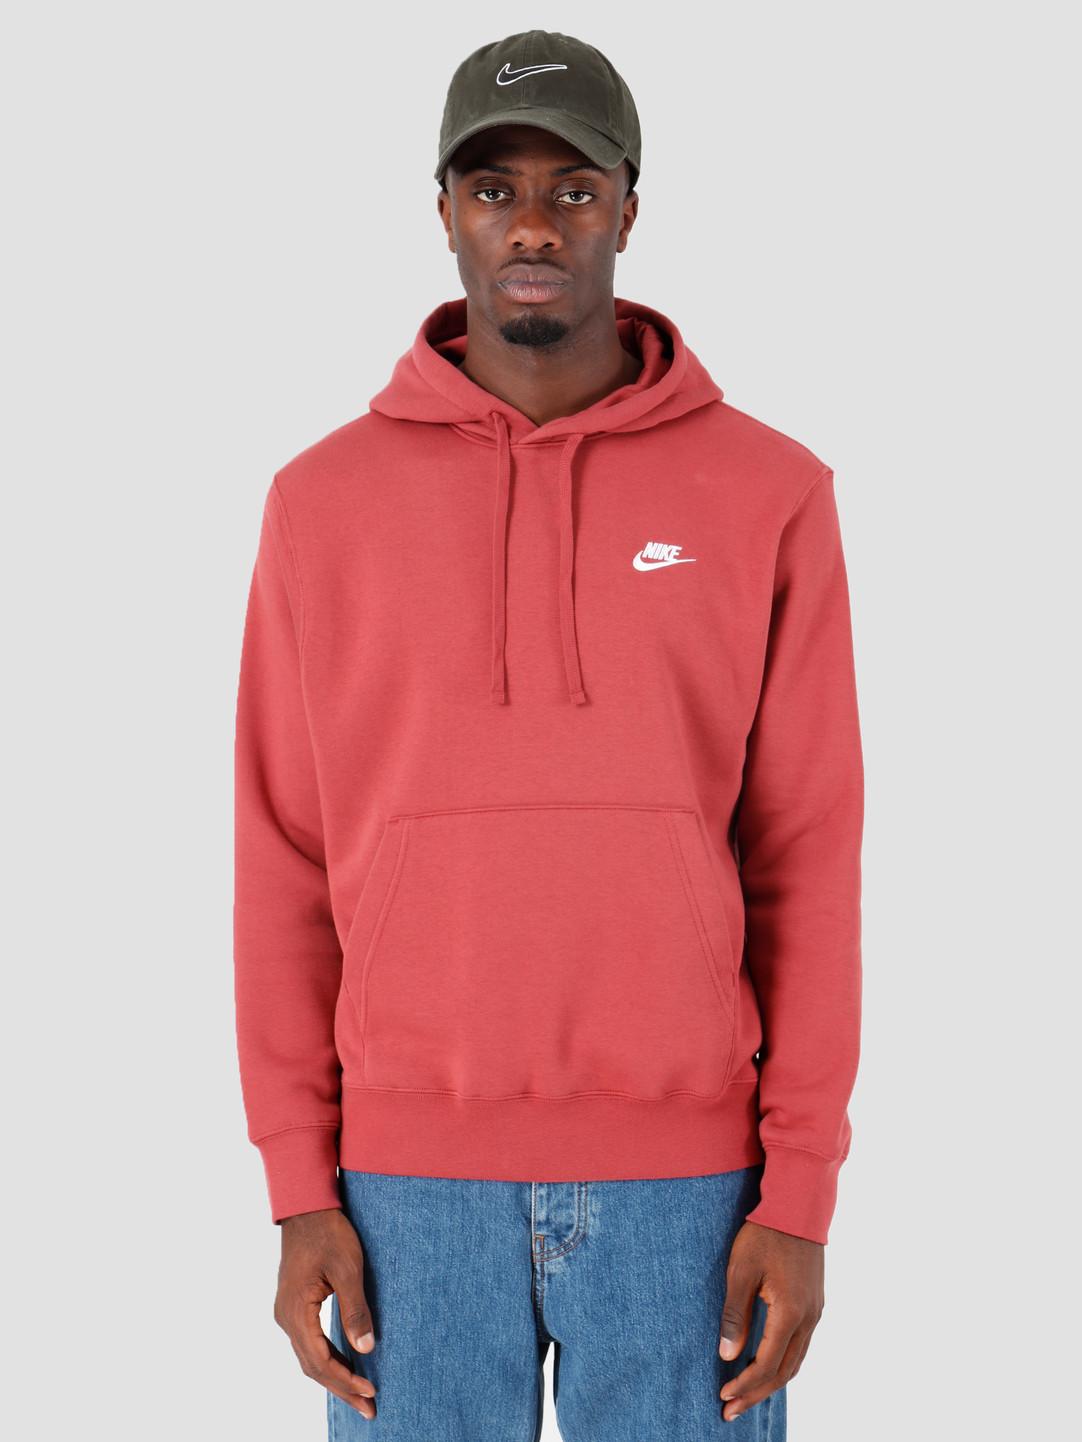 classic buy really comfortable Nike Sportswear Club Fleece Hoodie Cedar Cedar White Bv2654-661